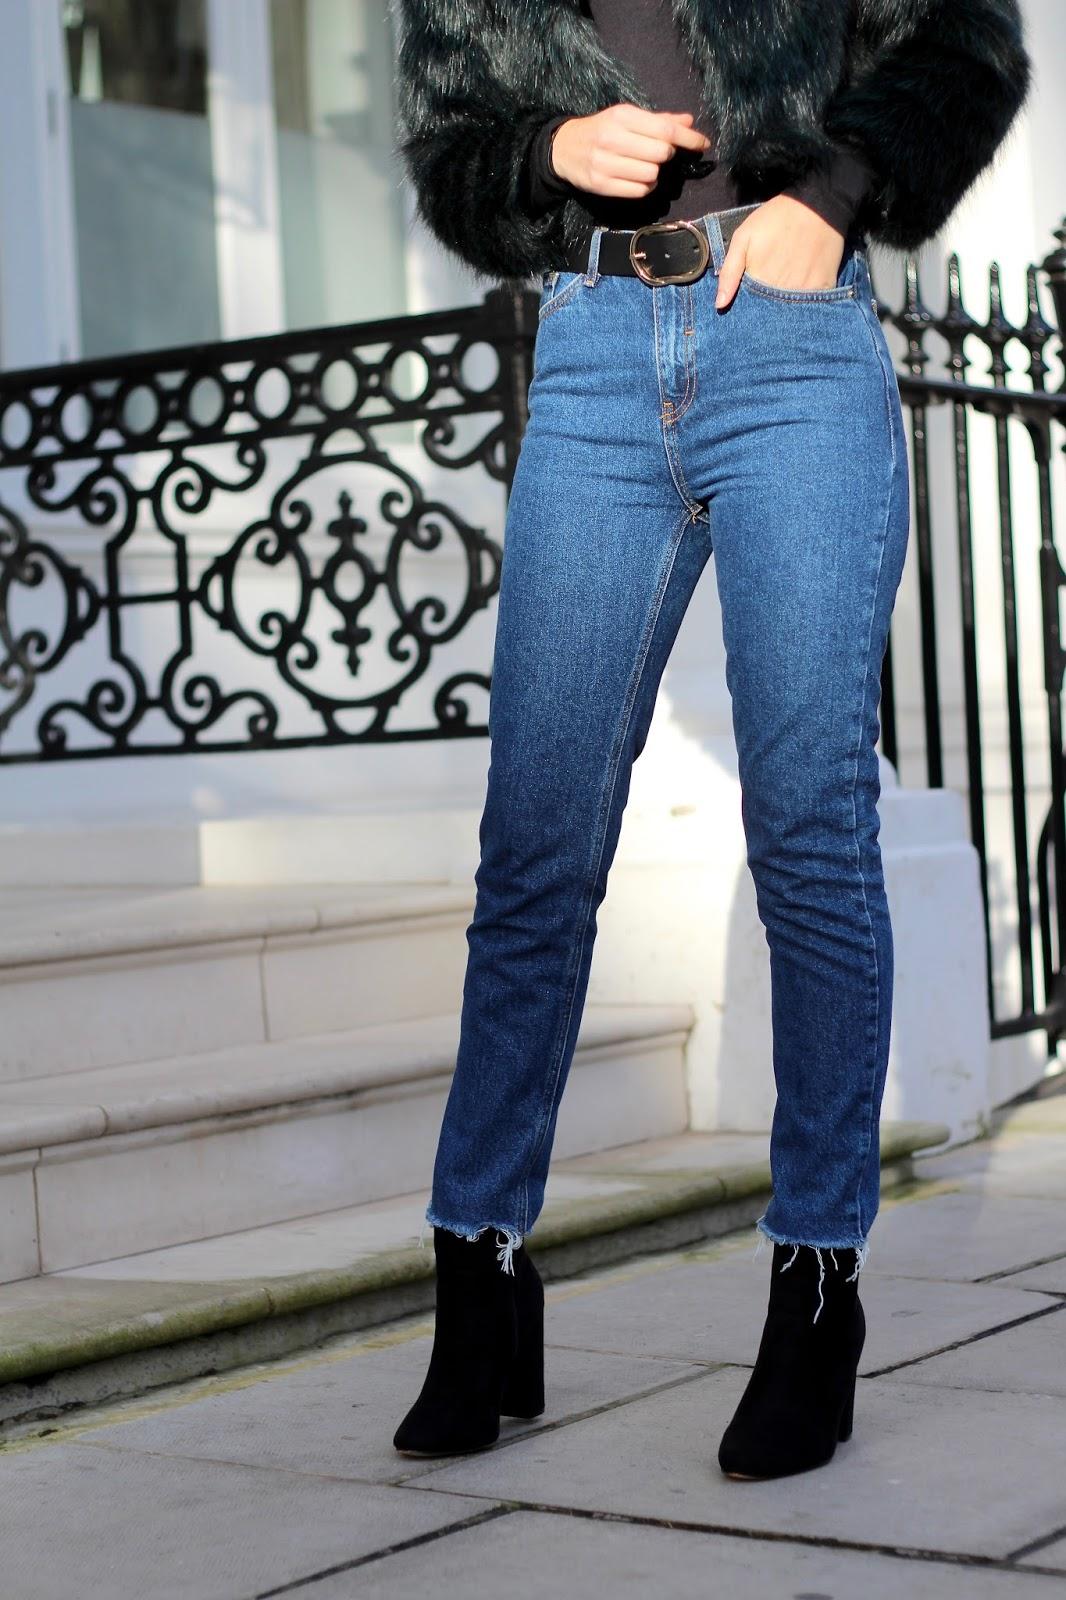 peexo blog winter fashion london